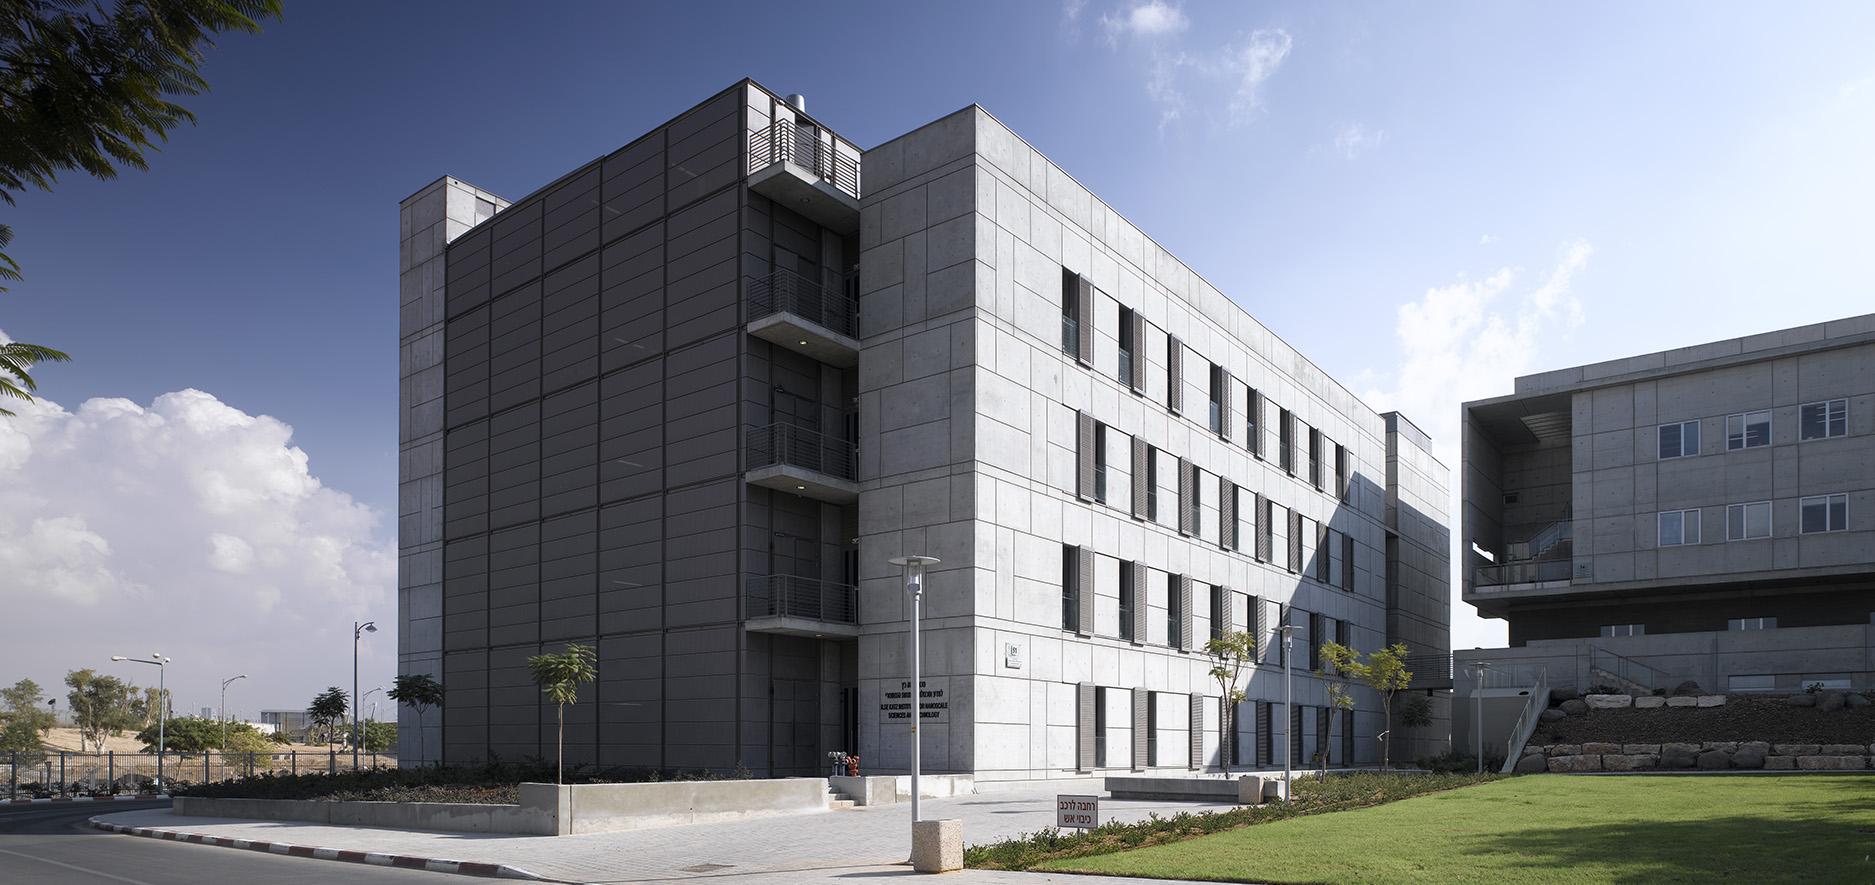 Nano Technologia Science and Technology BGU by Kolker Epstein Architect7